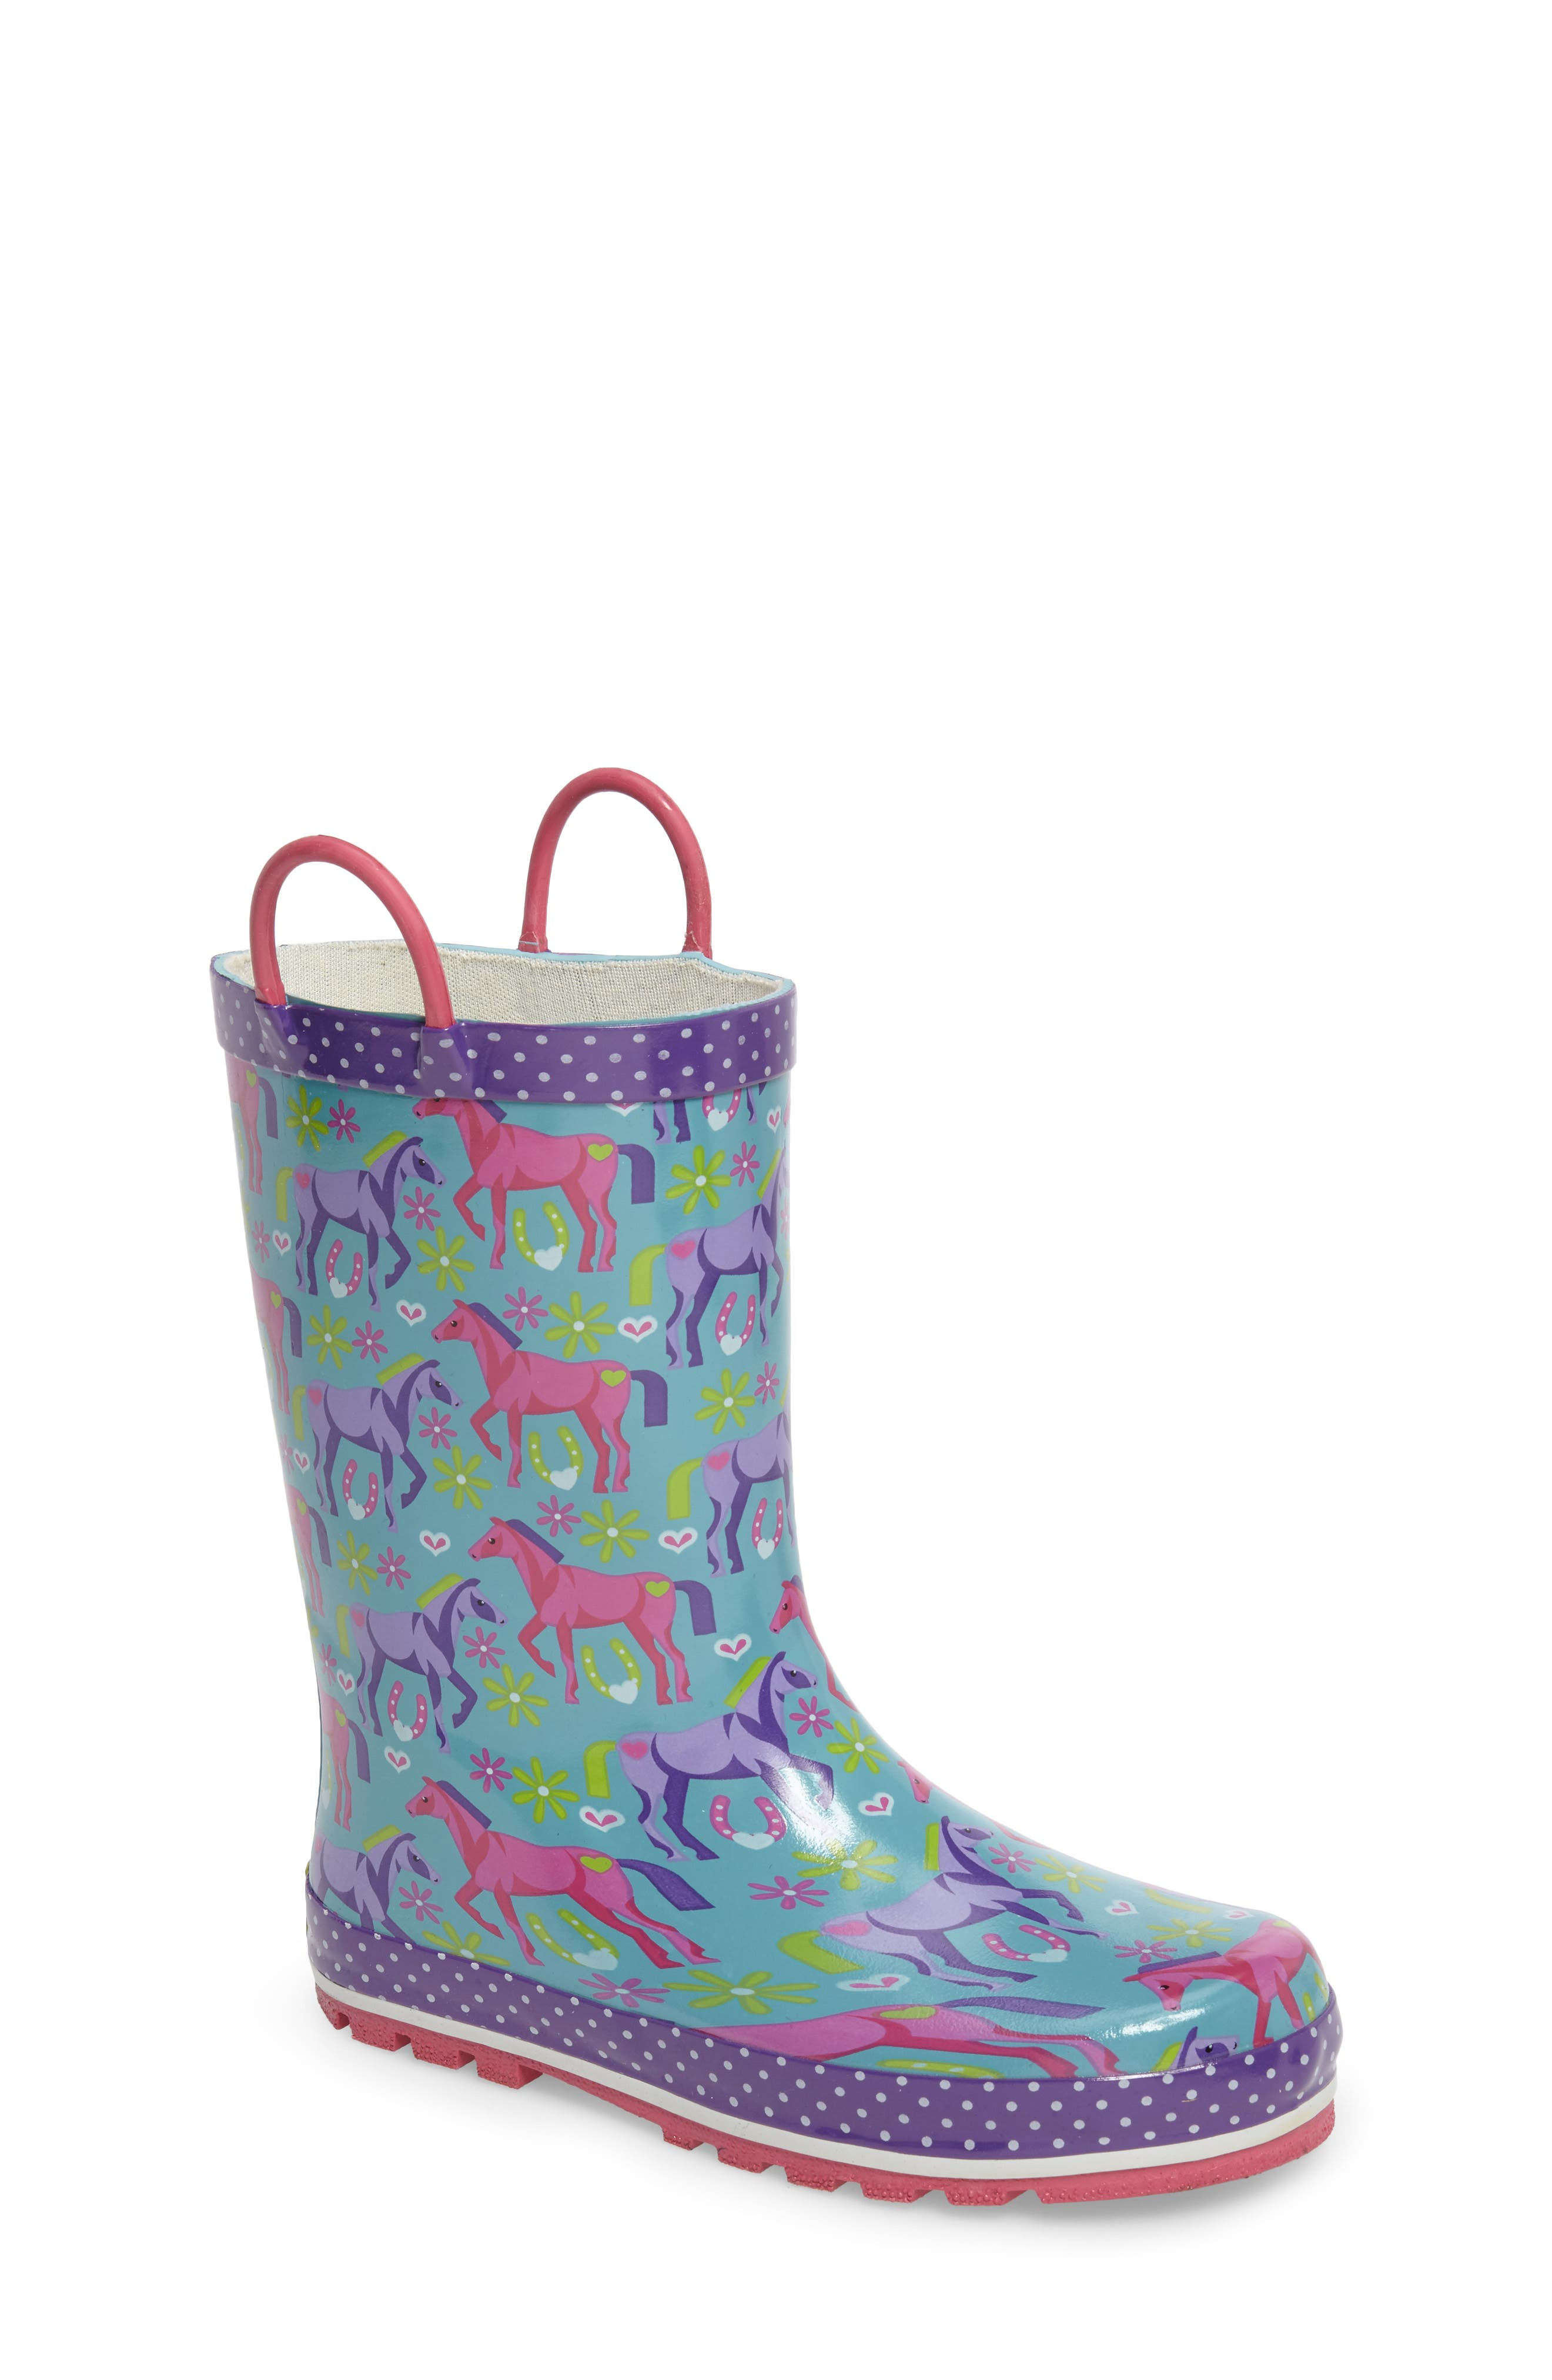 Main Image - Western Chief Hannah Horse Rain Boot (Toddler, Little Kid & Big Kid)